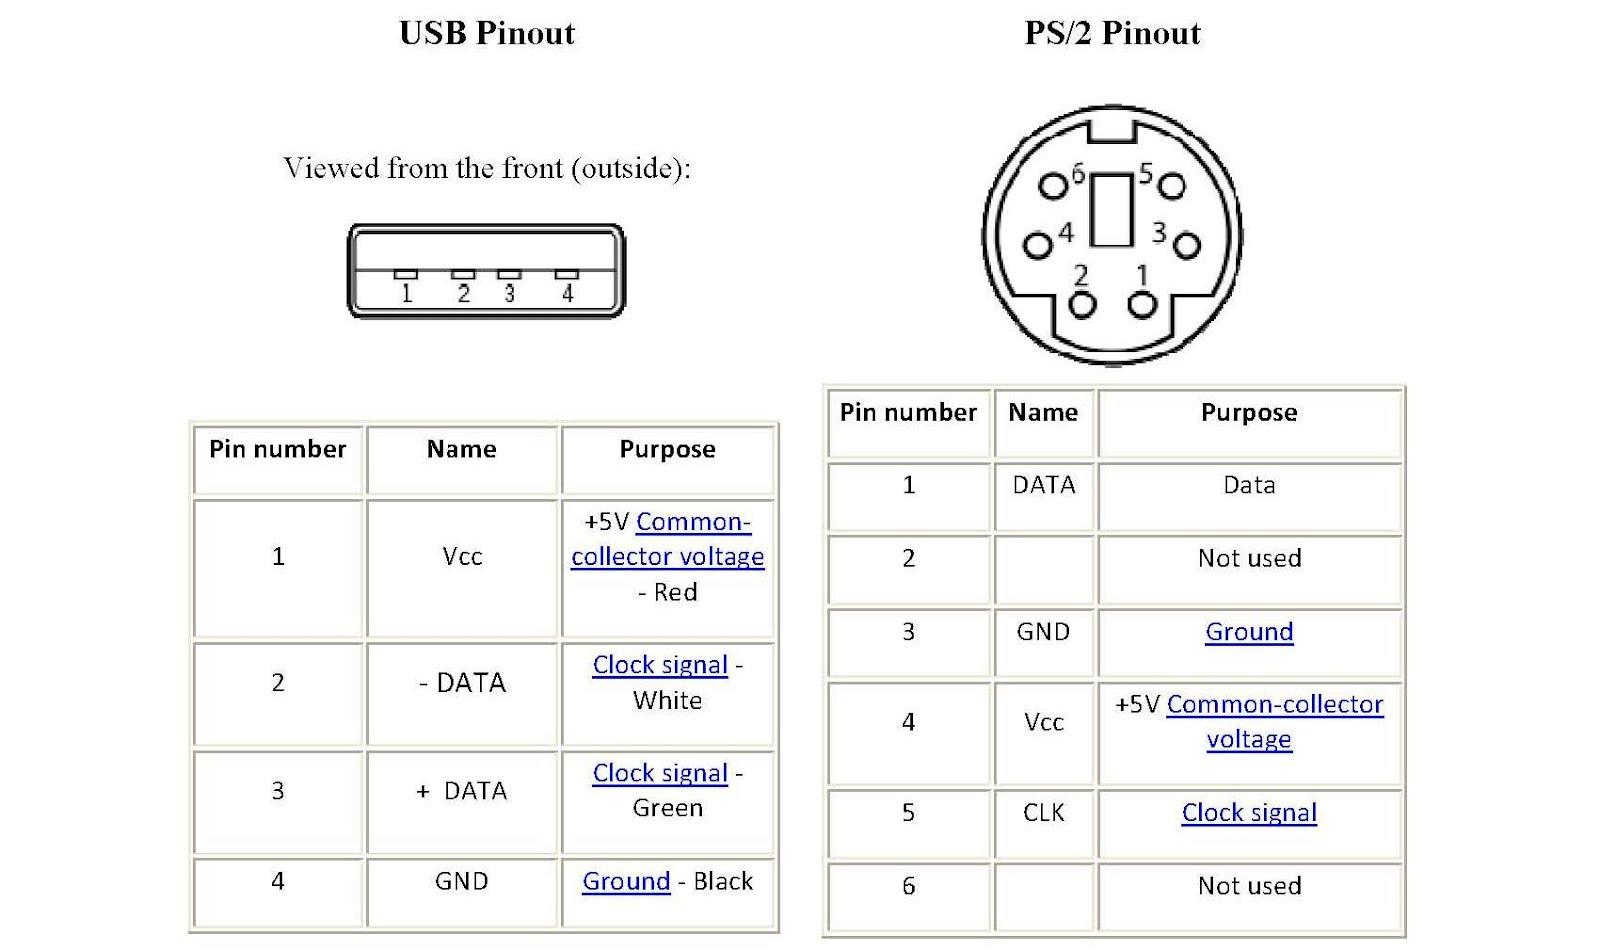 Playstation 2 To Usb Wiring Diagram 4 Pin T Connector Conversão Teclado Ps2 Gt Zwame Fórum